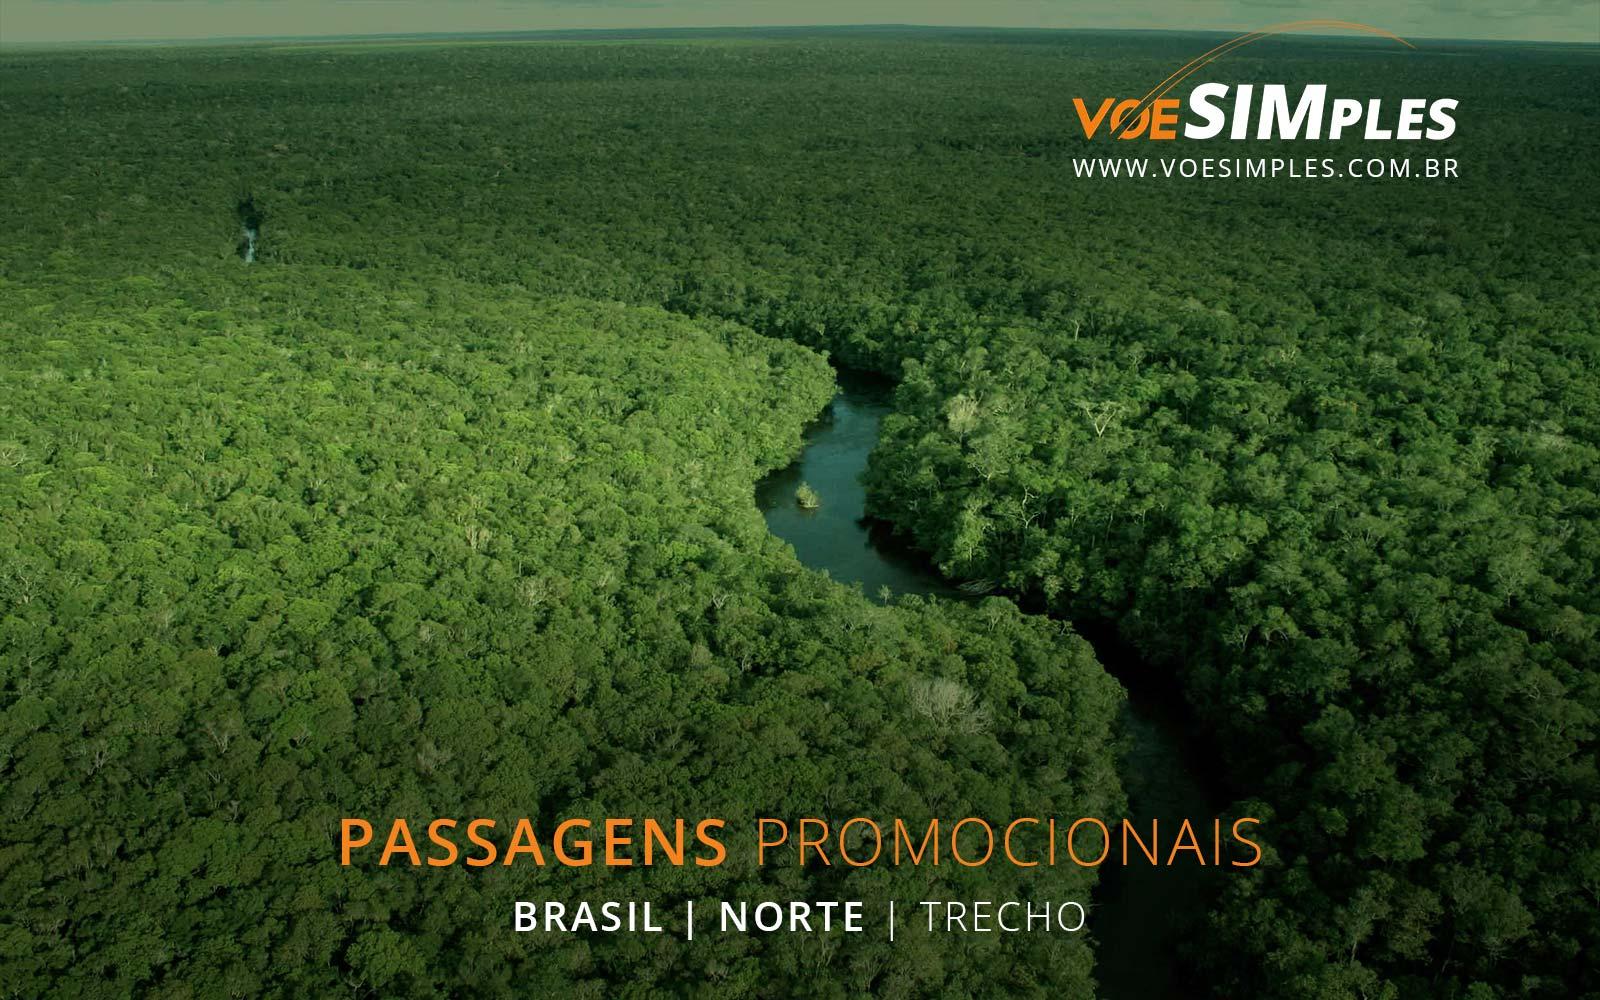 passagens-aereas-promocionais-brasil-voe-simples-passagem-aerea-promocional-barata-promocao-passagem-aviao-passagens-aereas-brasil-norte-trecho